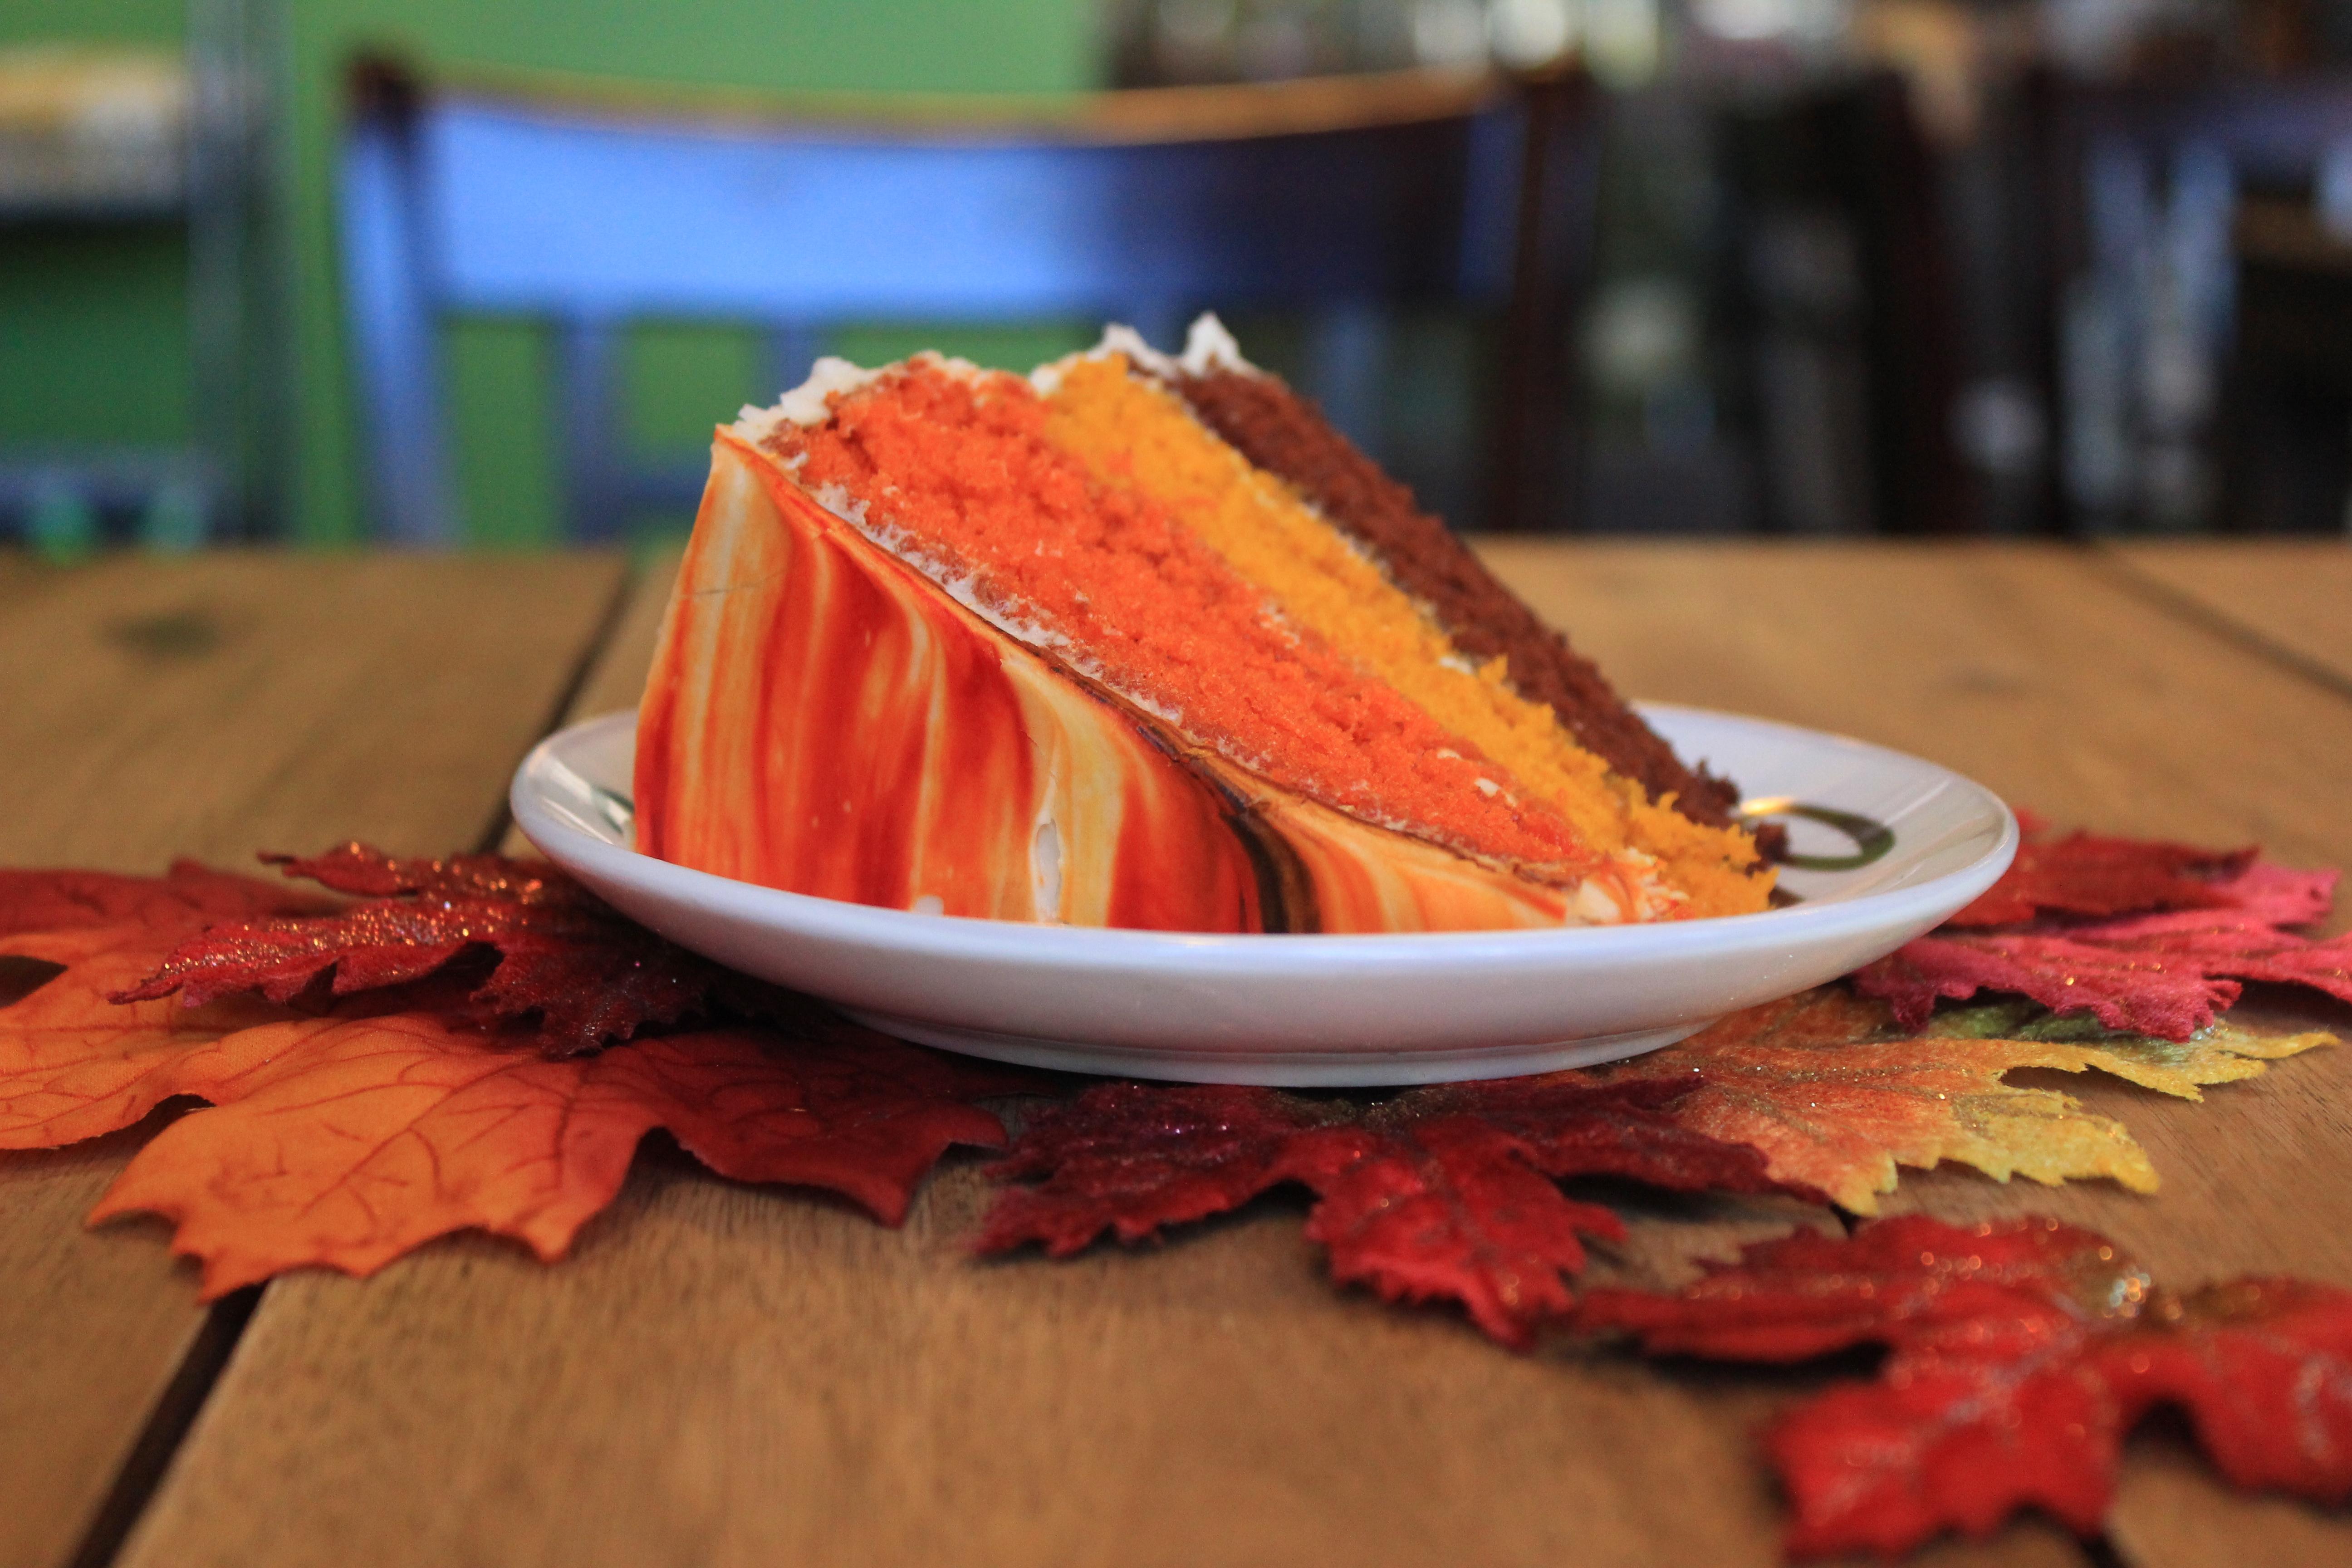 The Fall Festival Cake